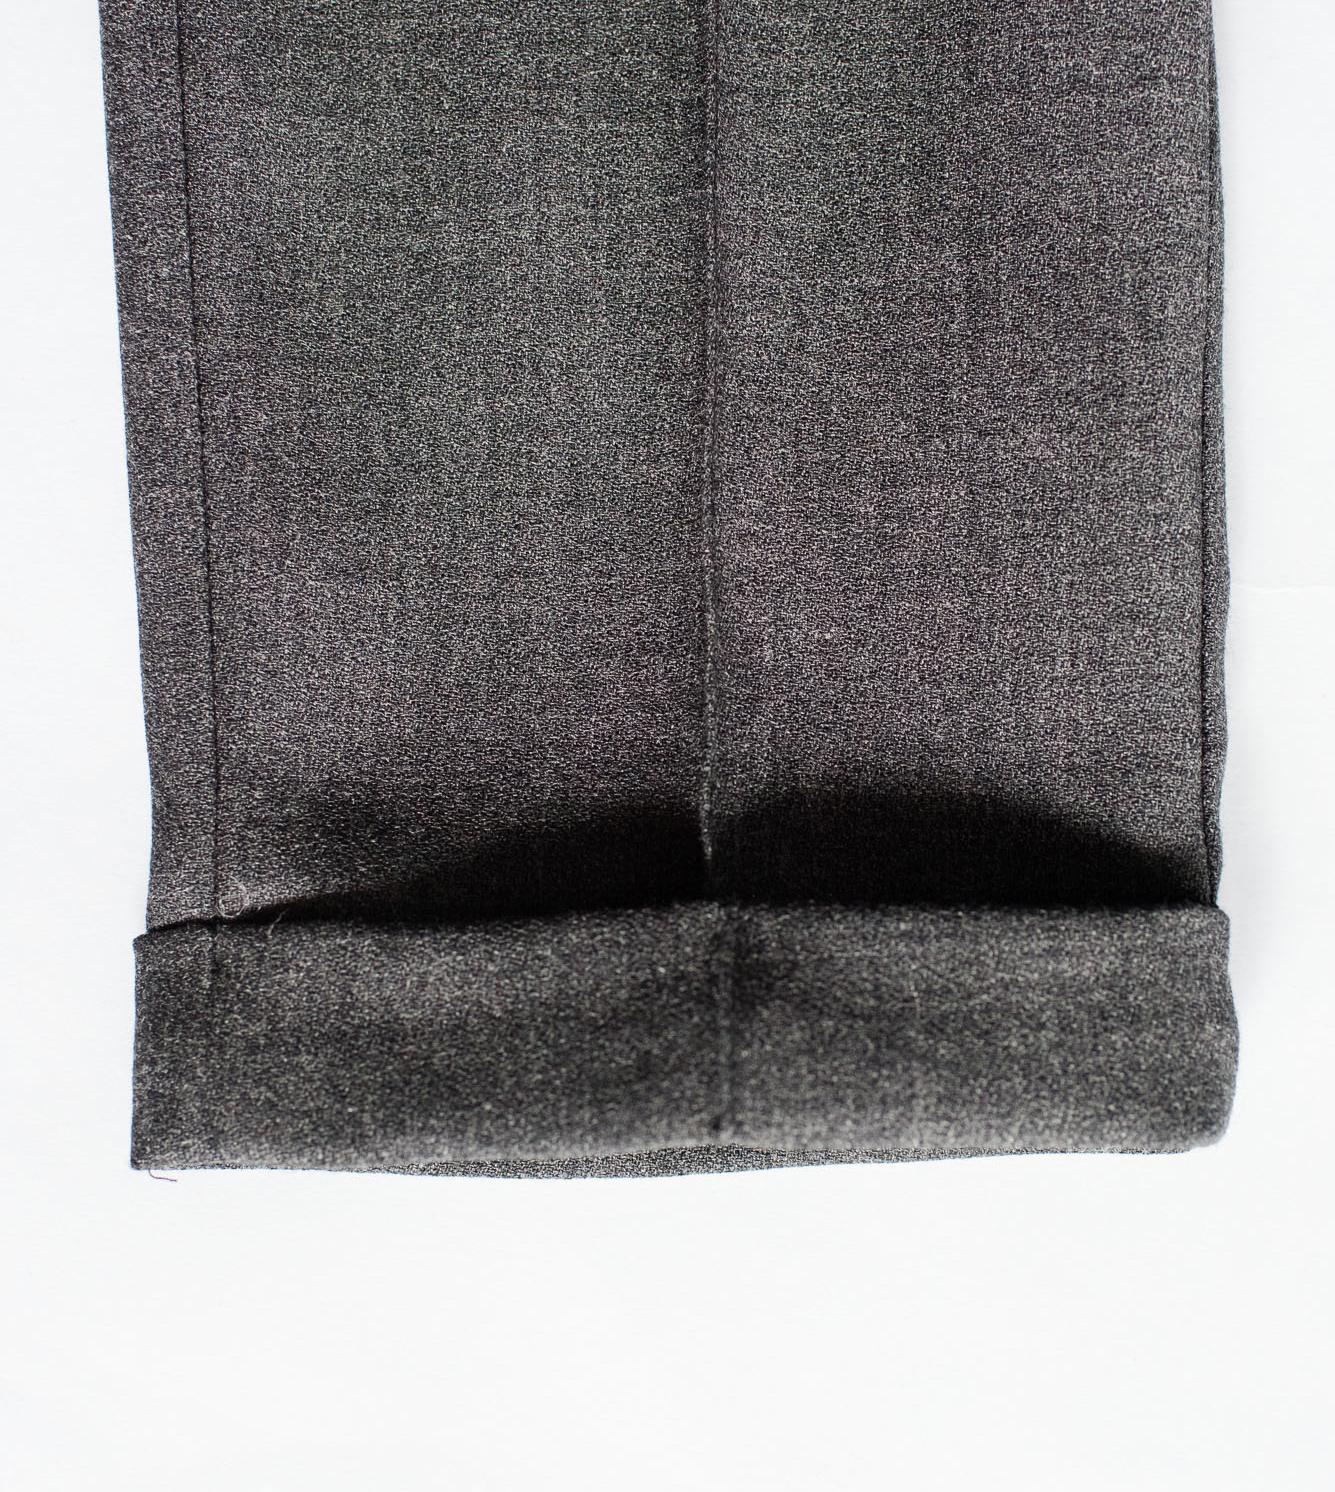 robinson-pdf-sewing-trouser43.jpg